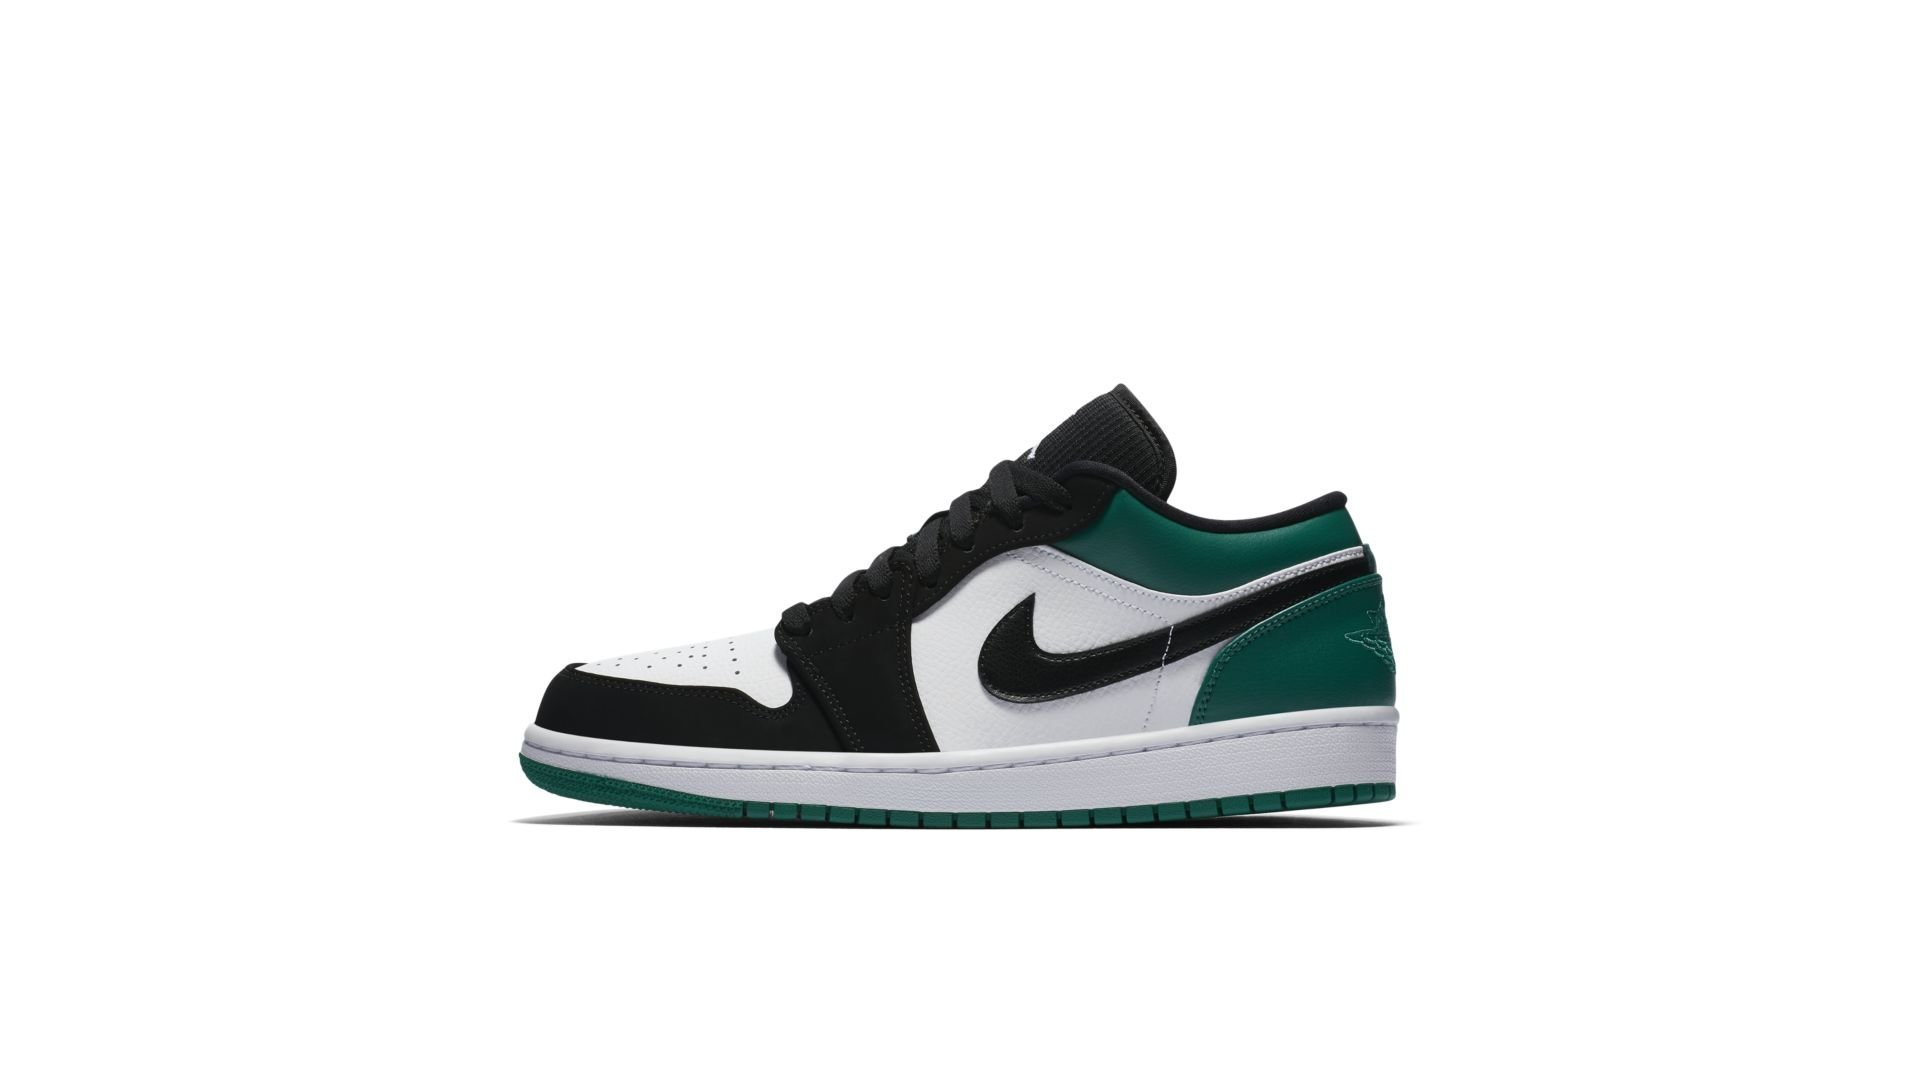 Jordan 1 Low White Black Mystic Green (553558-113)